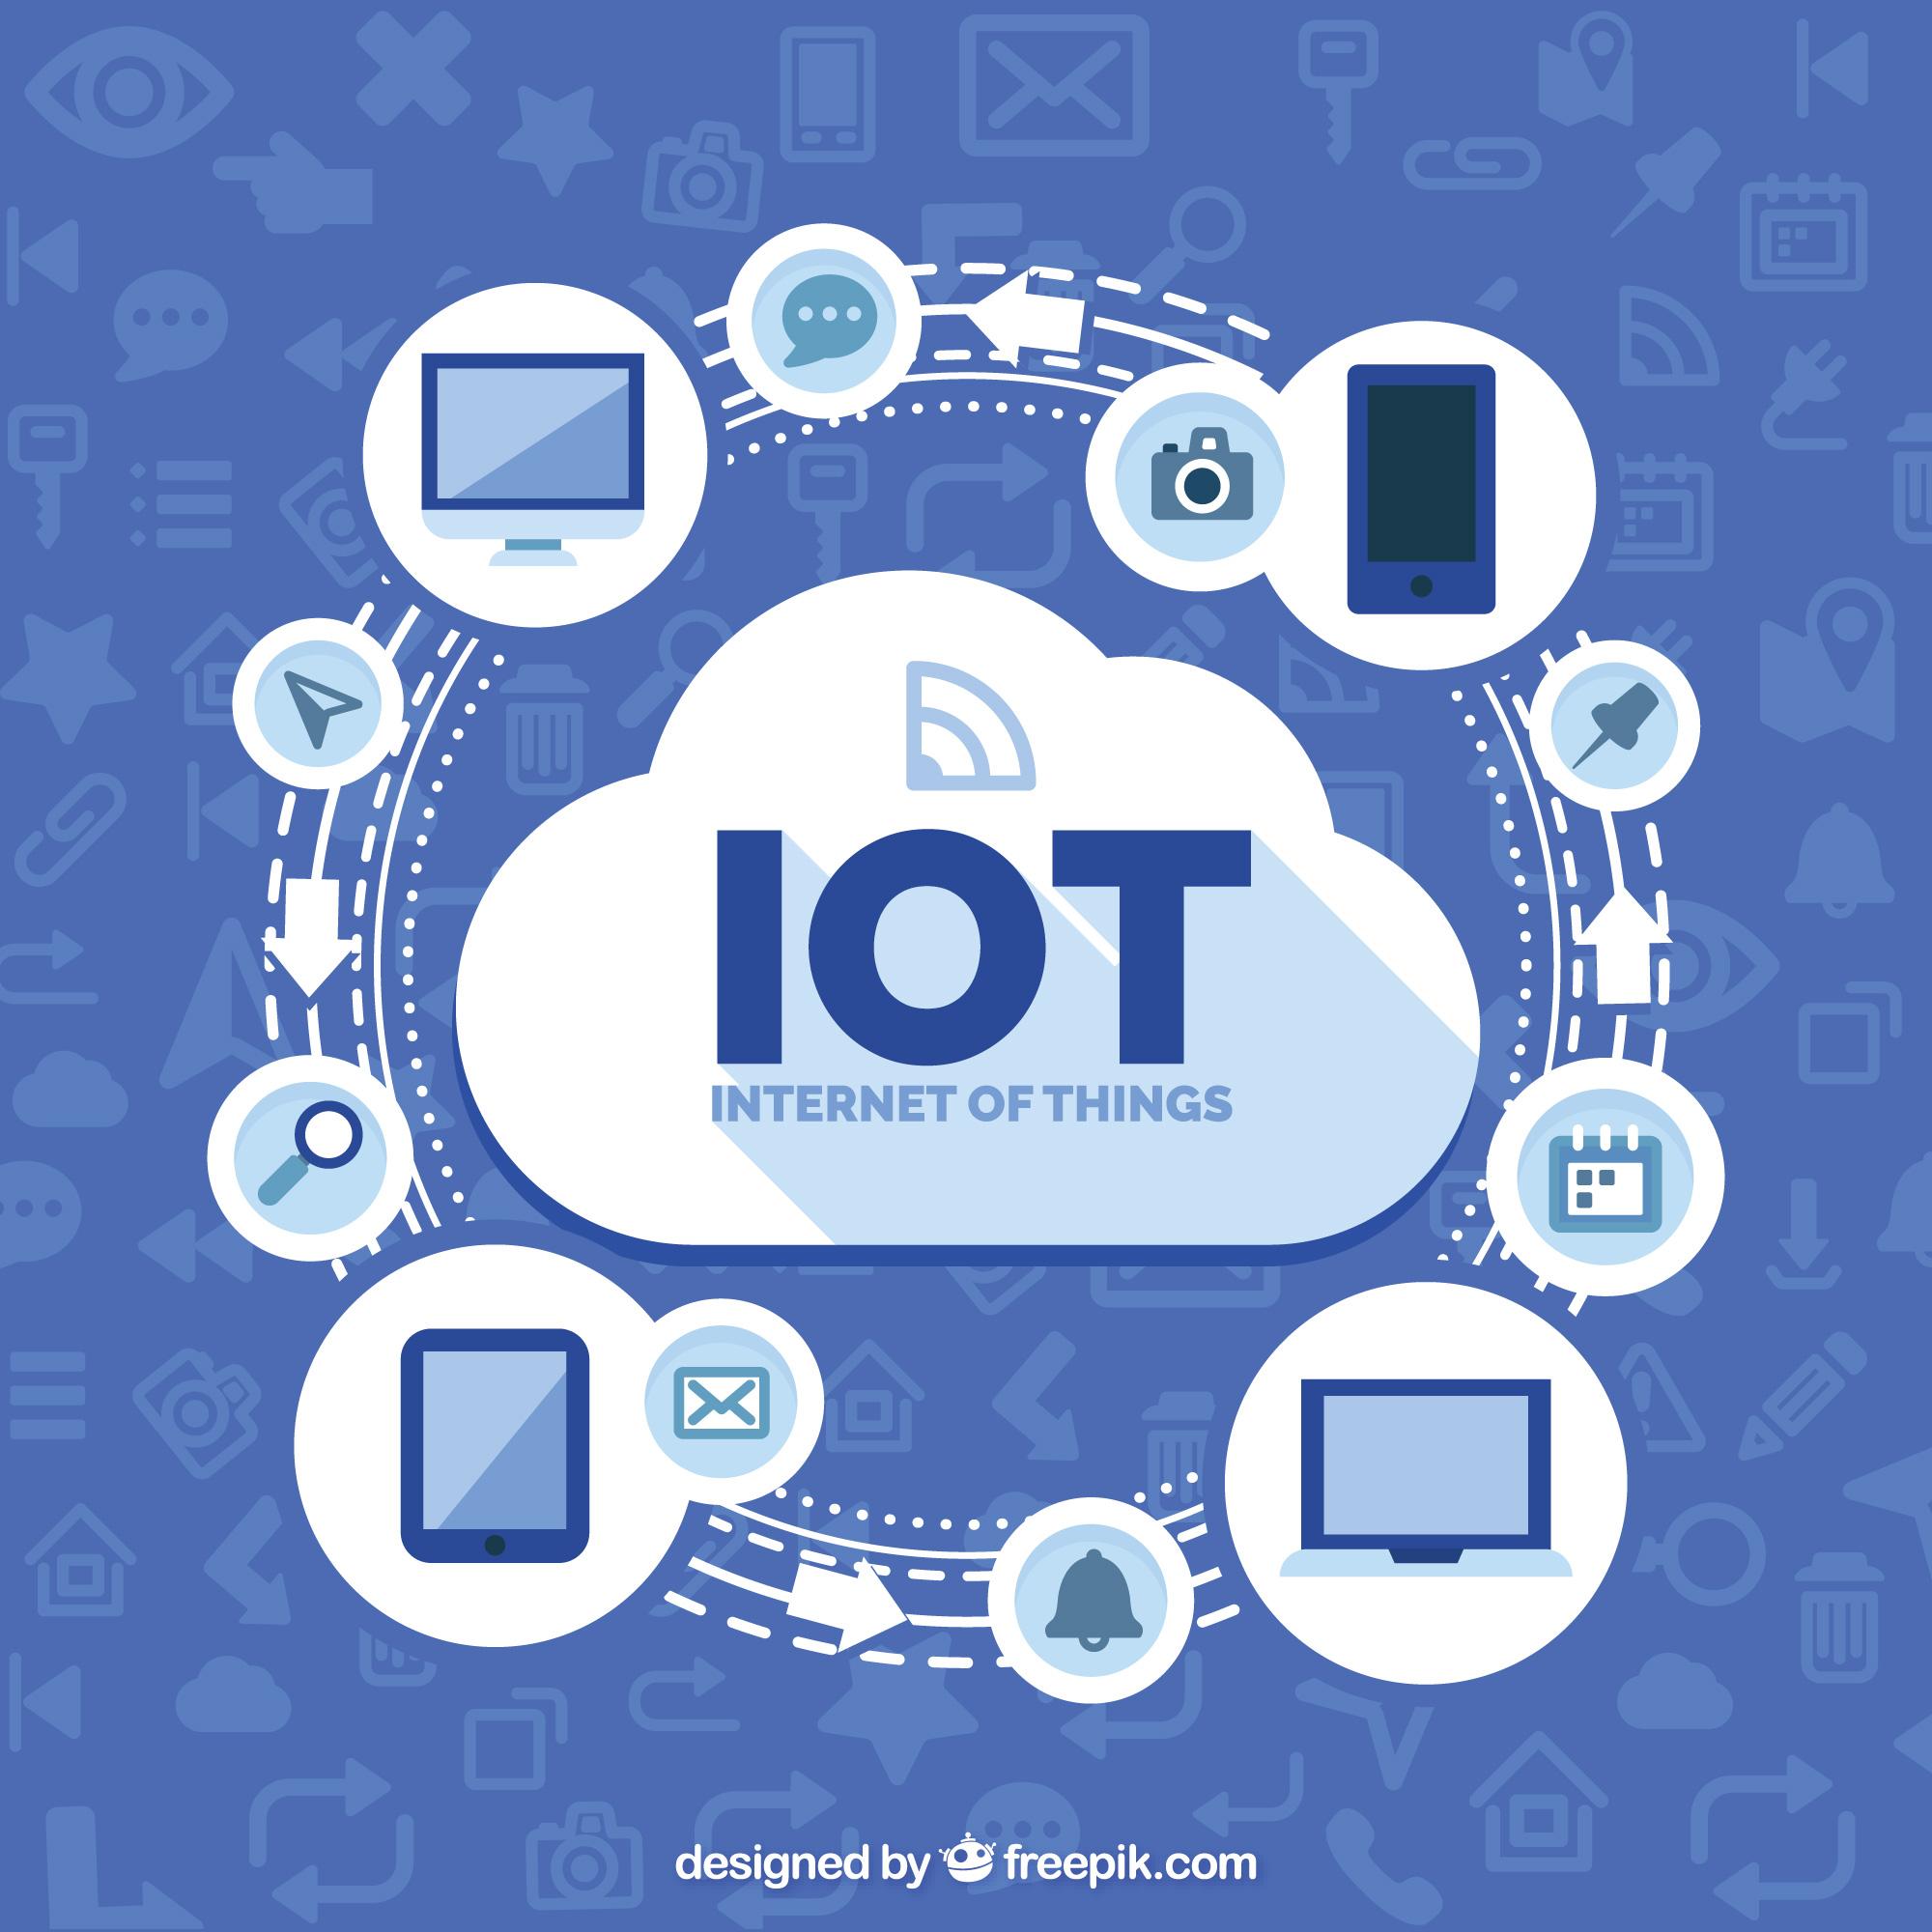 architecting IOT based apps